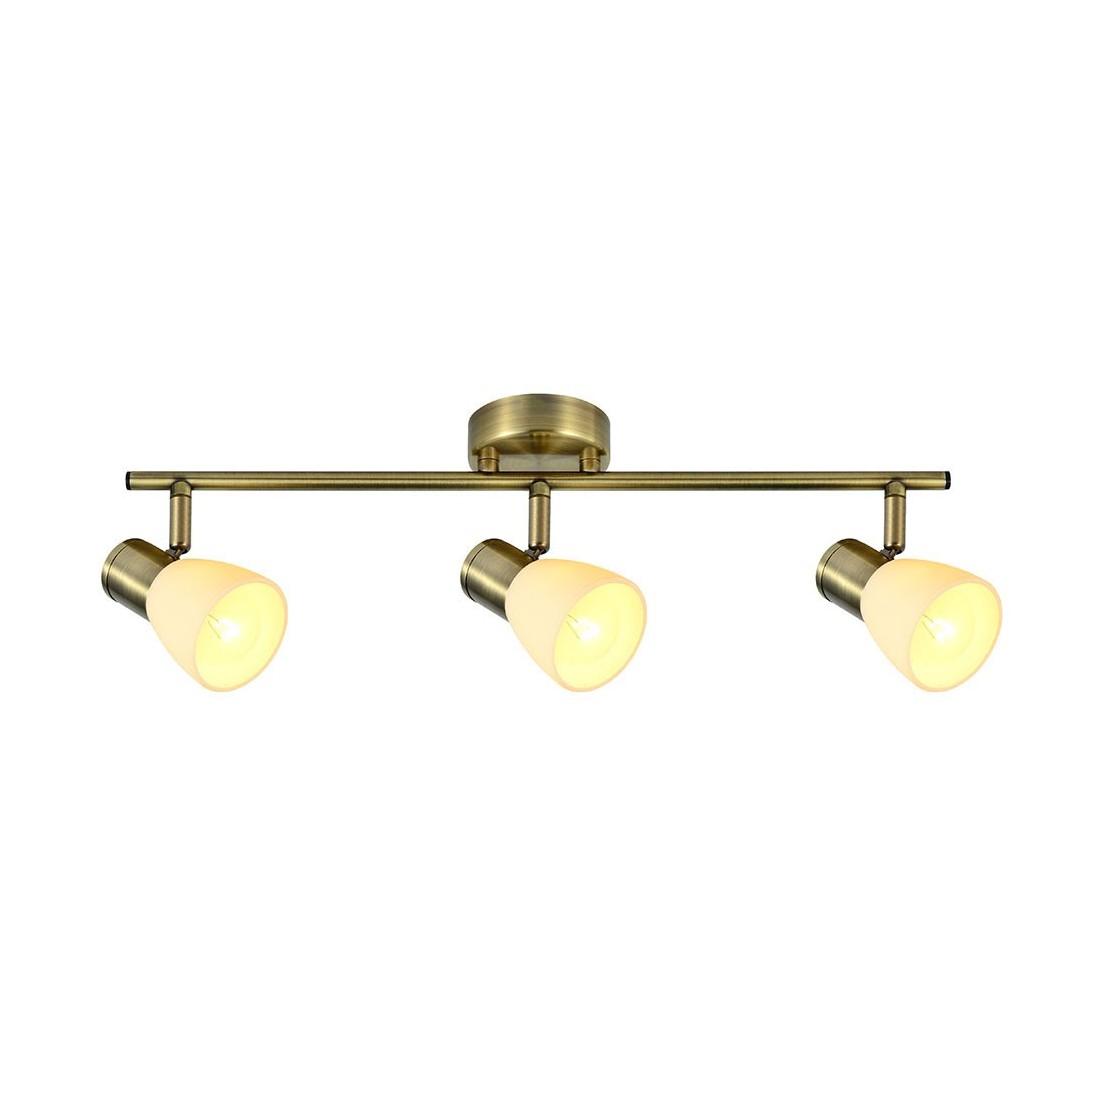 Iluminacion decorativa iluminacion online tiendas - Lamparas de pie para salon ...